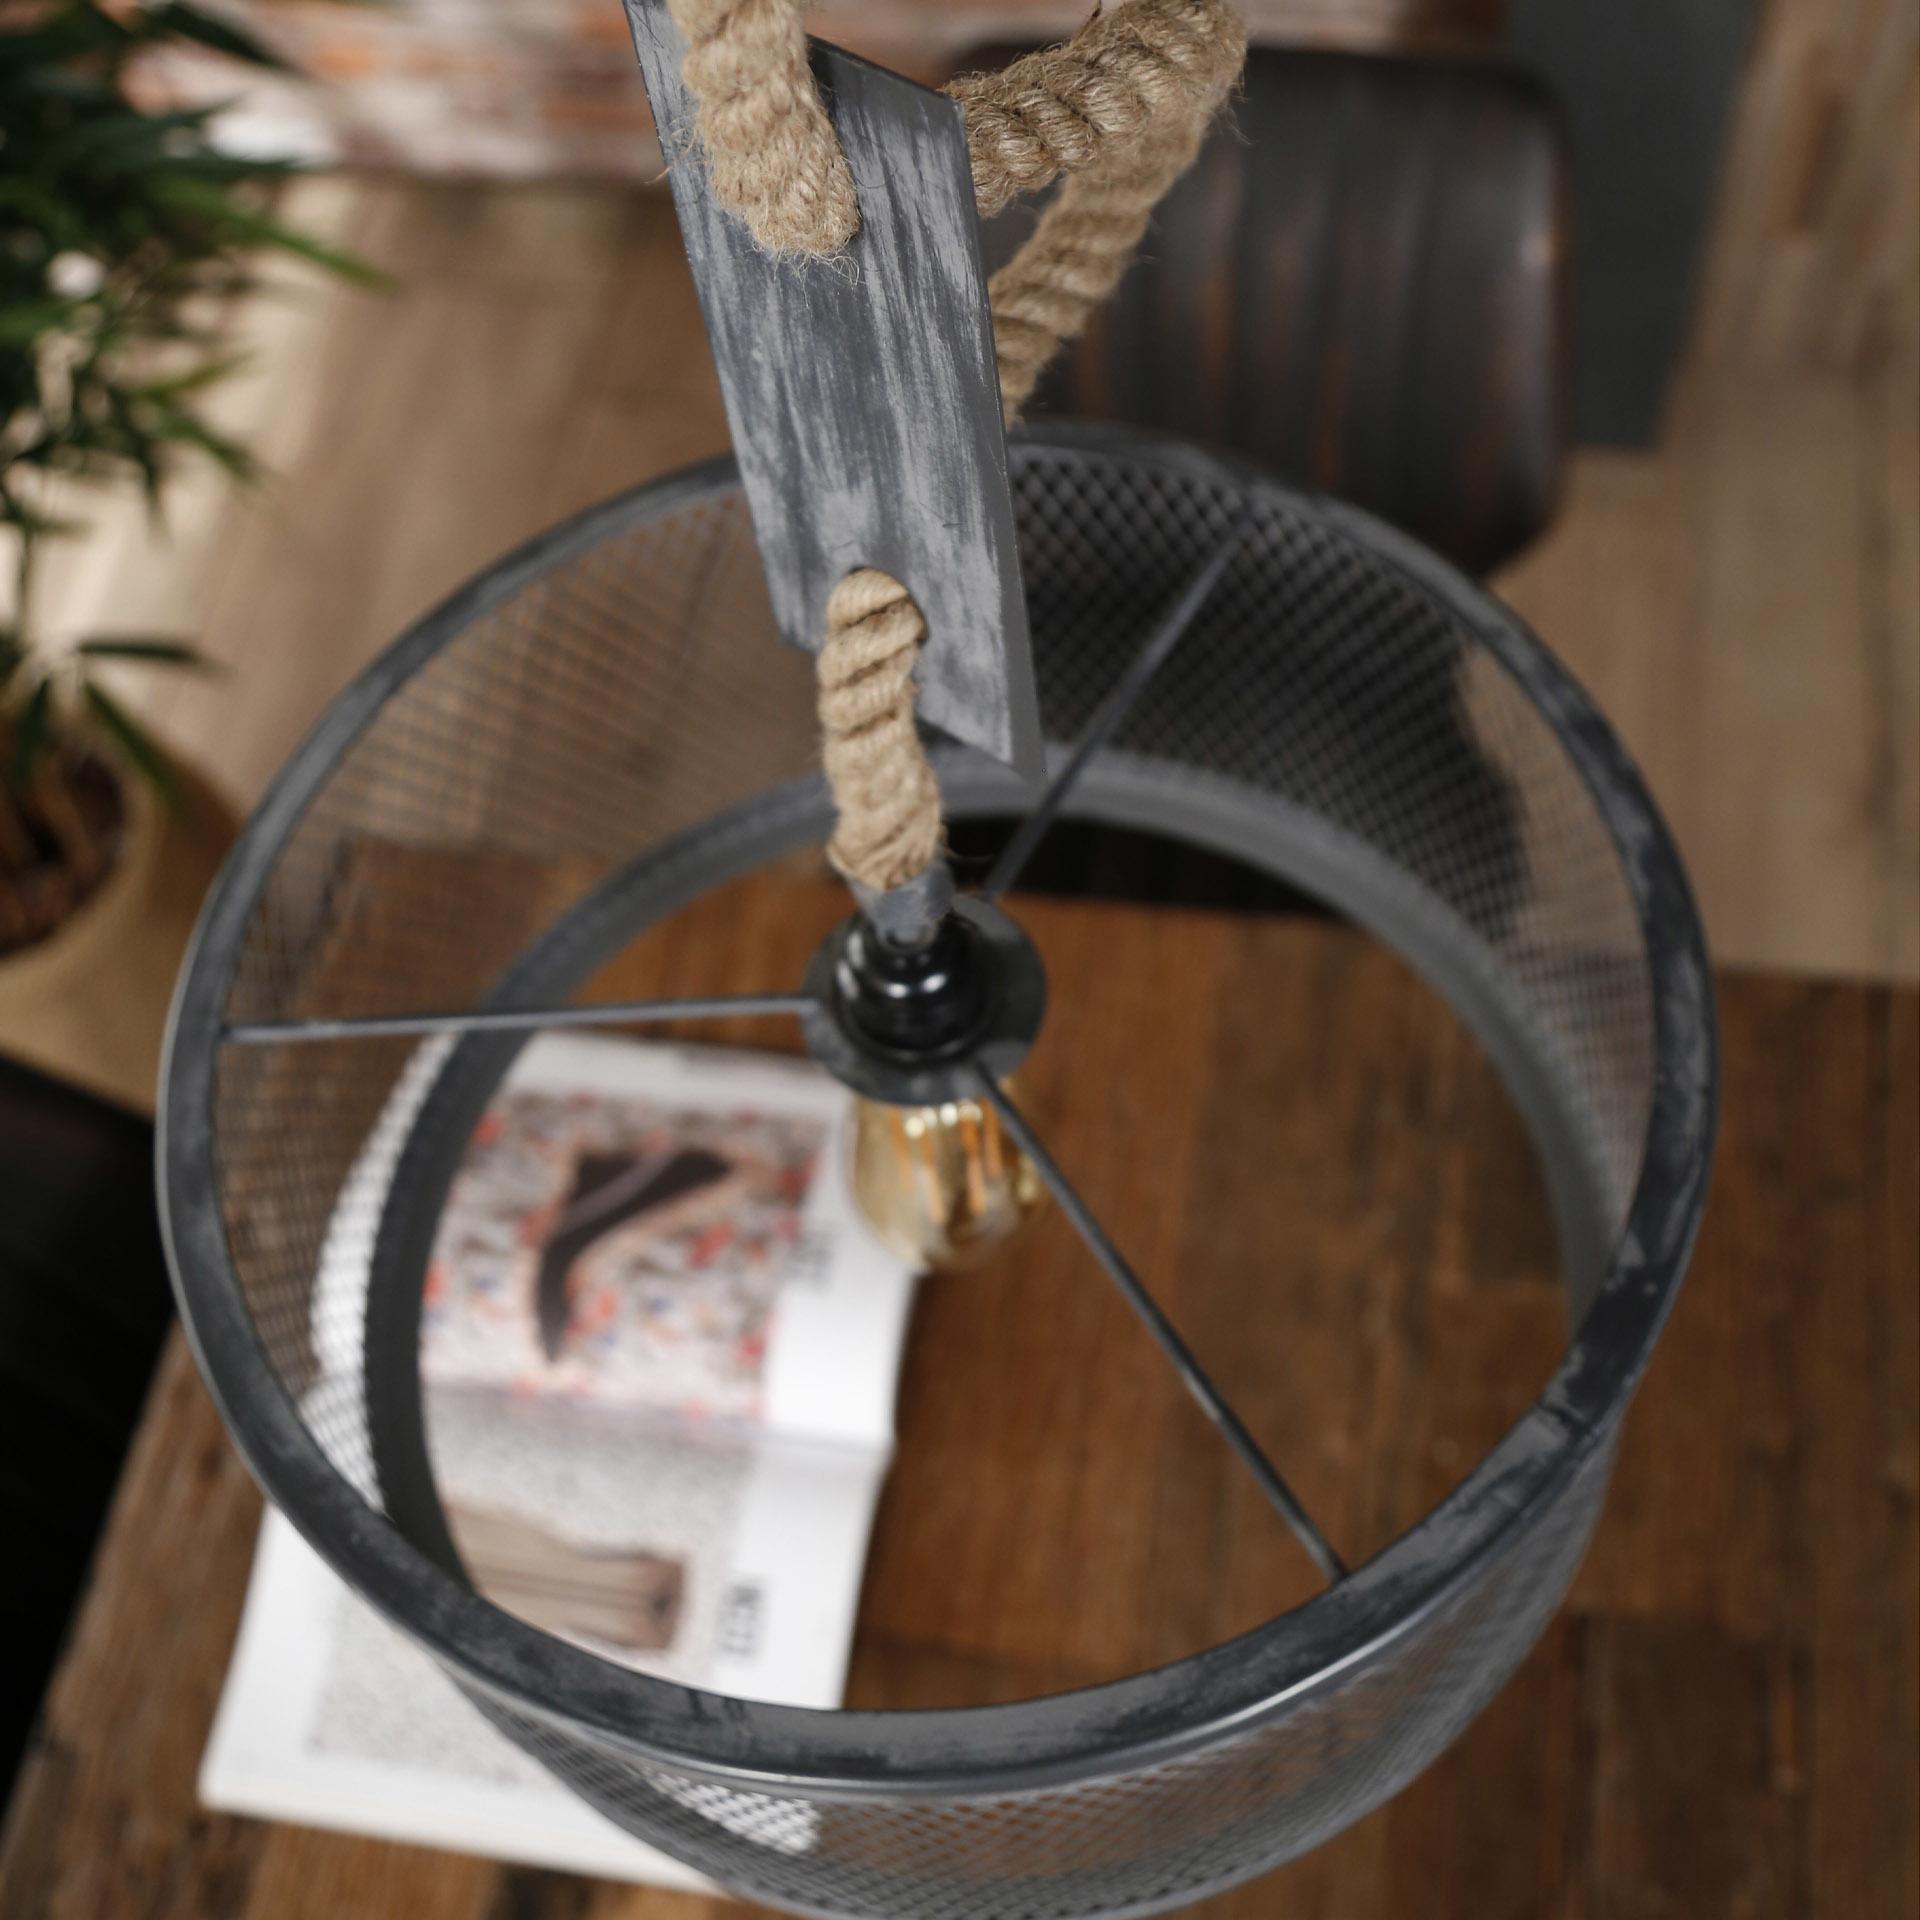 Duverger Rope - Hanglamp - cilinder - metaal gaas - dia 40cm  - verstelbaar touw